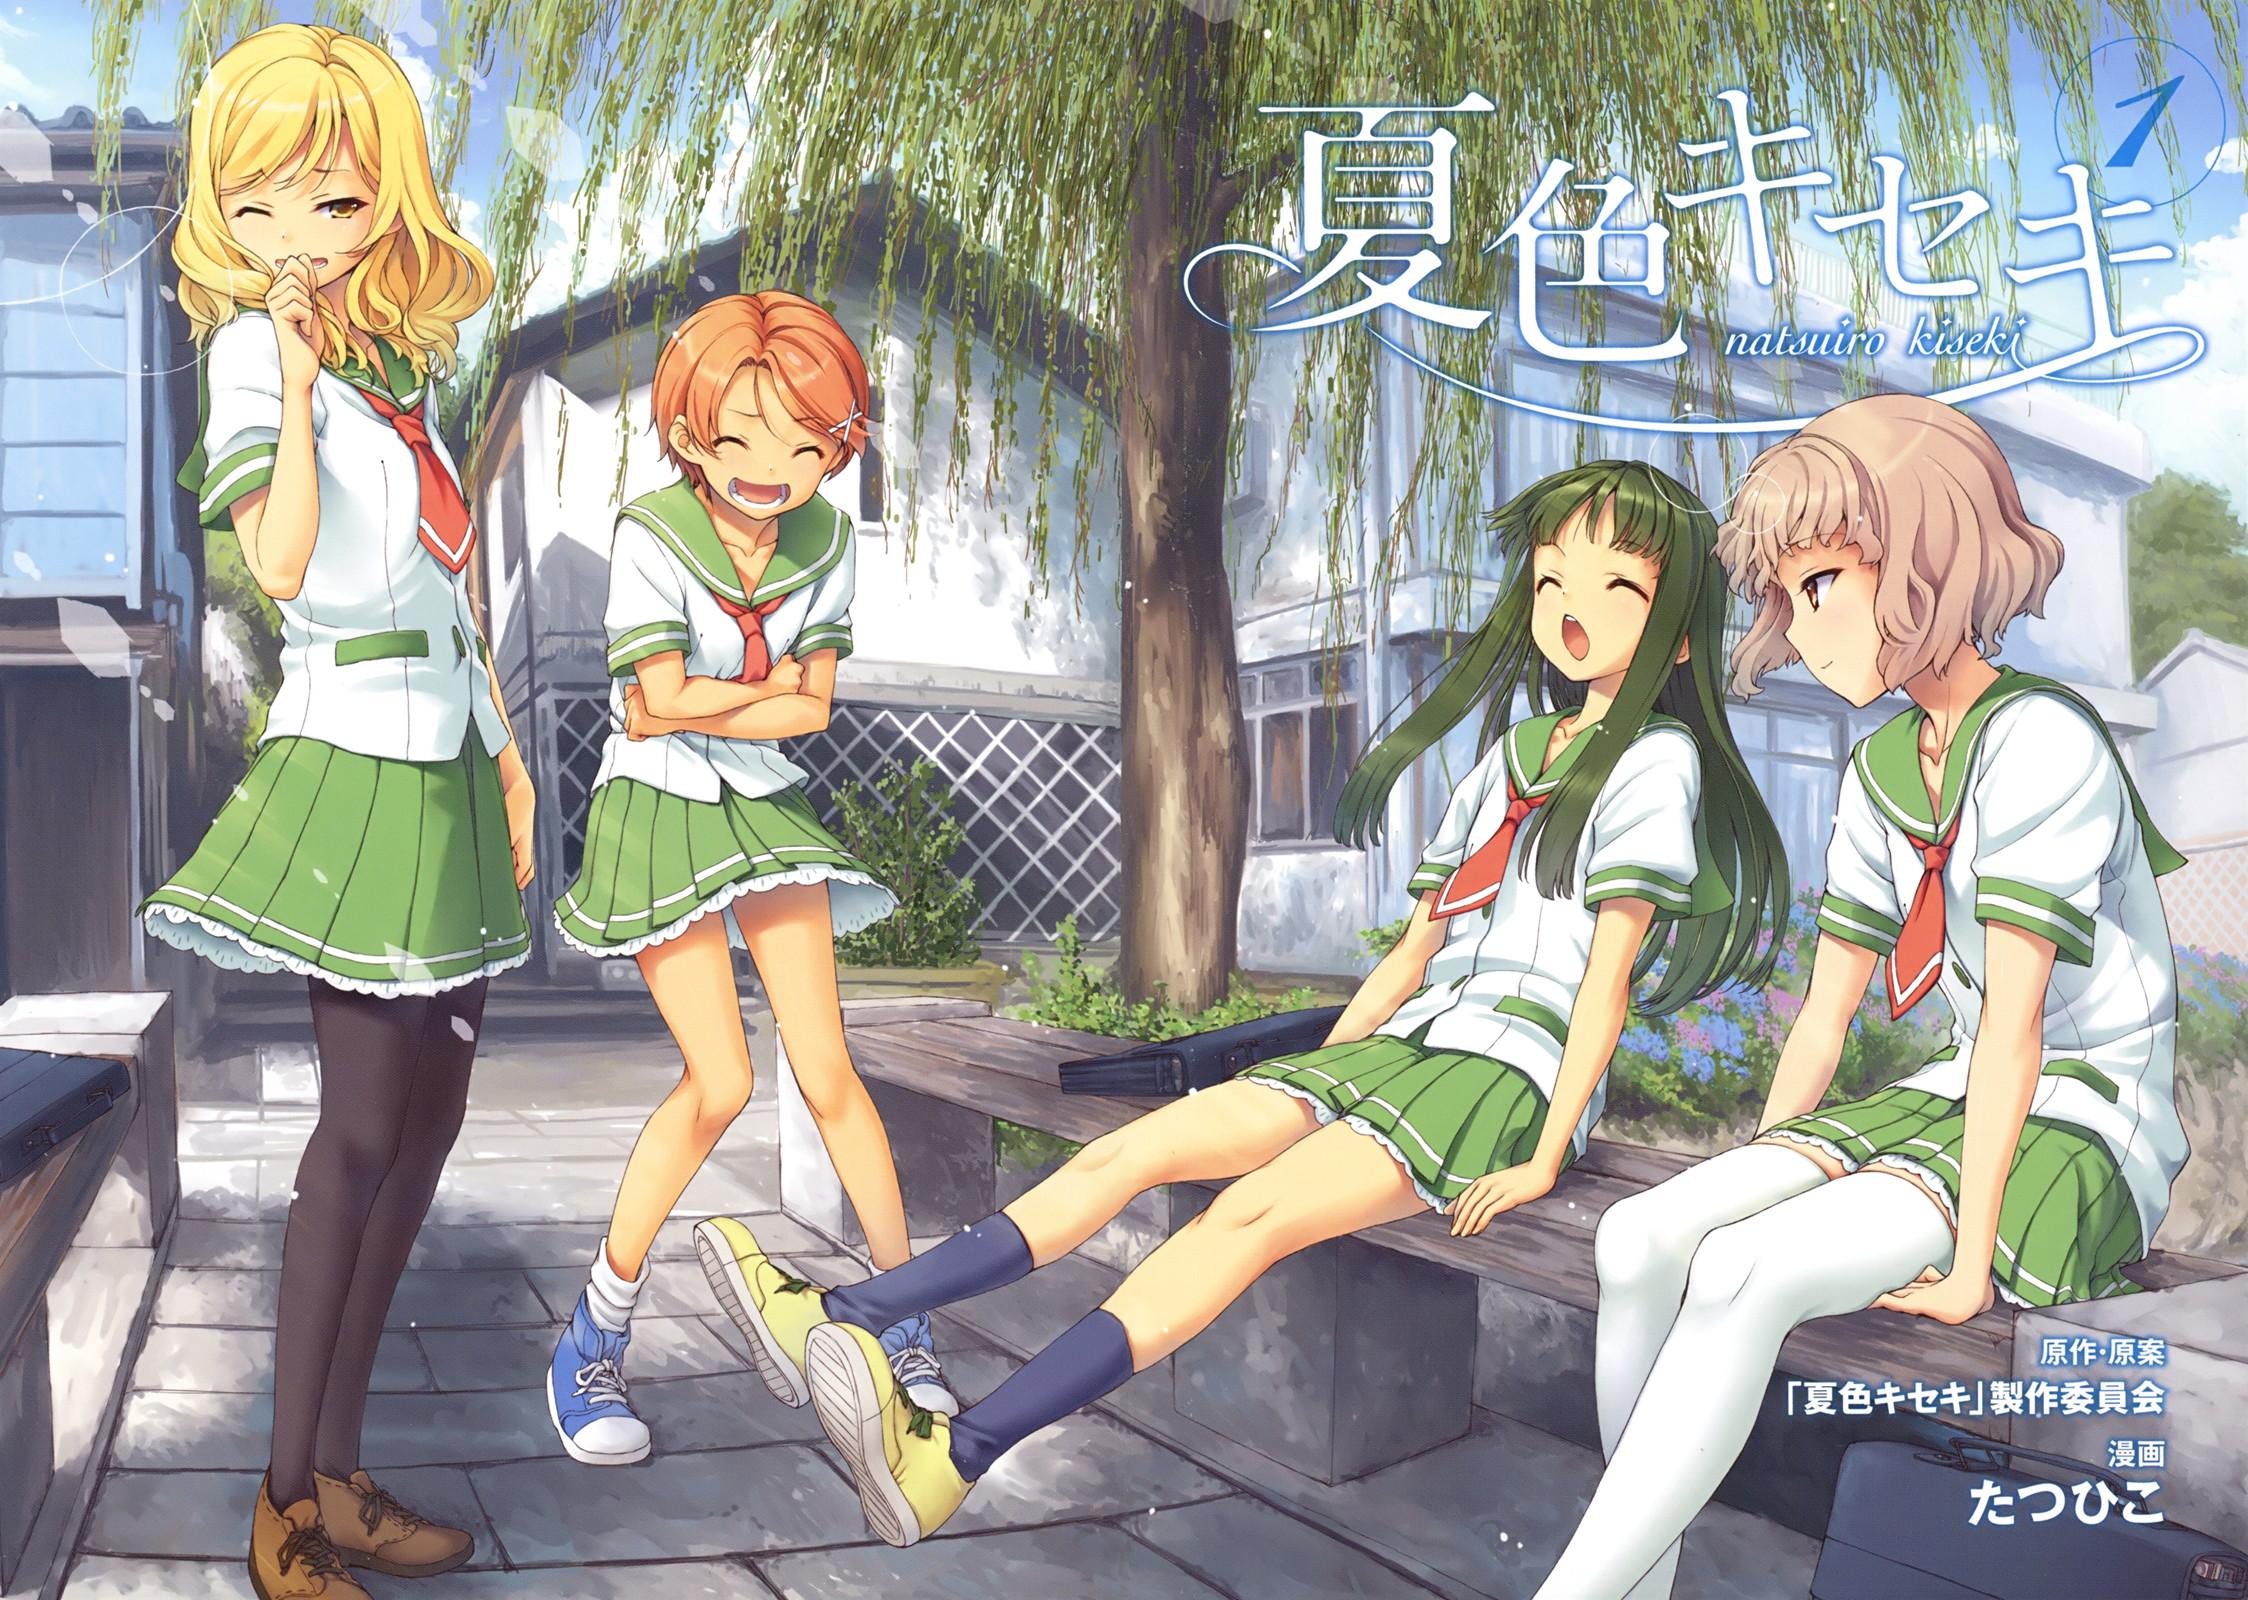 Natsu Iro Kiseki Wallpapers Anime Hq Natsu Iro Kiseki Pictures 4k Wallpapers 2019